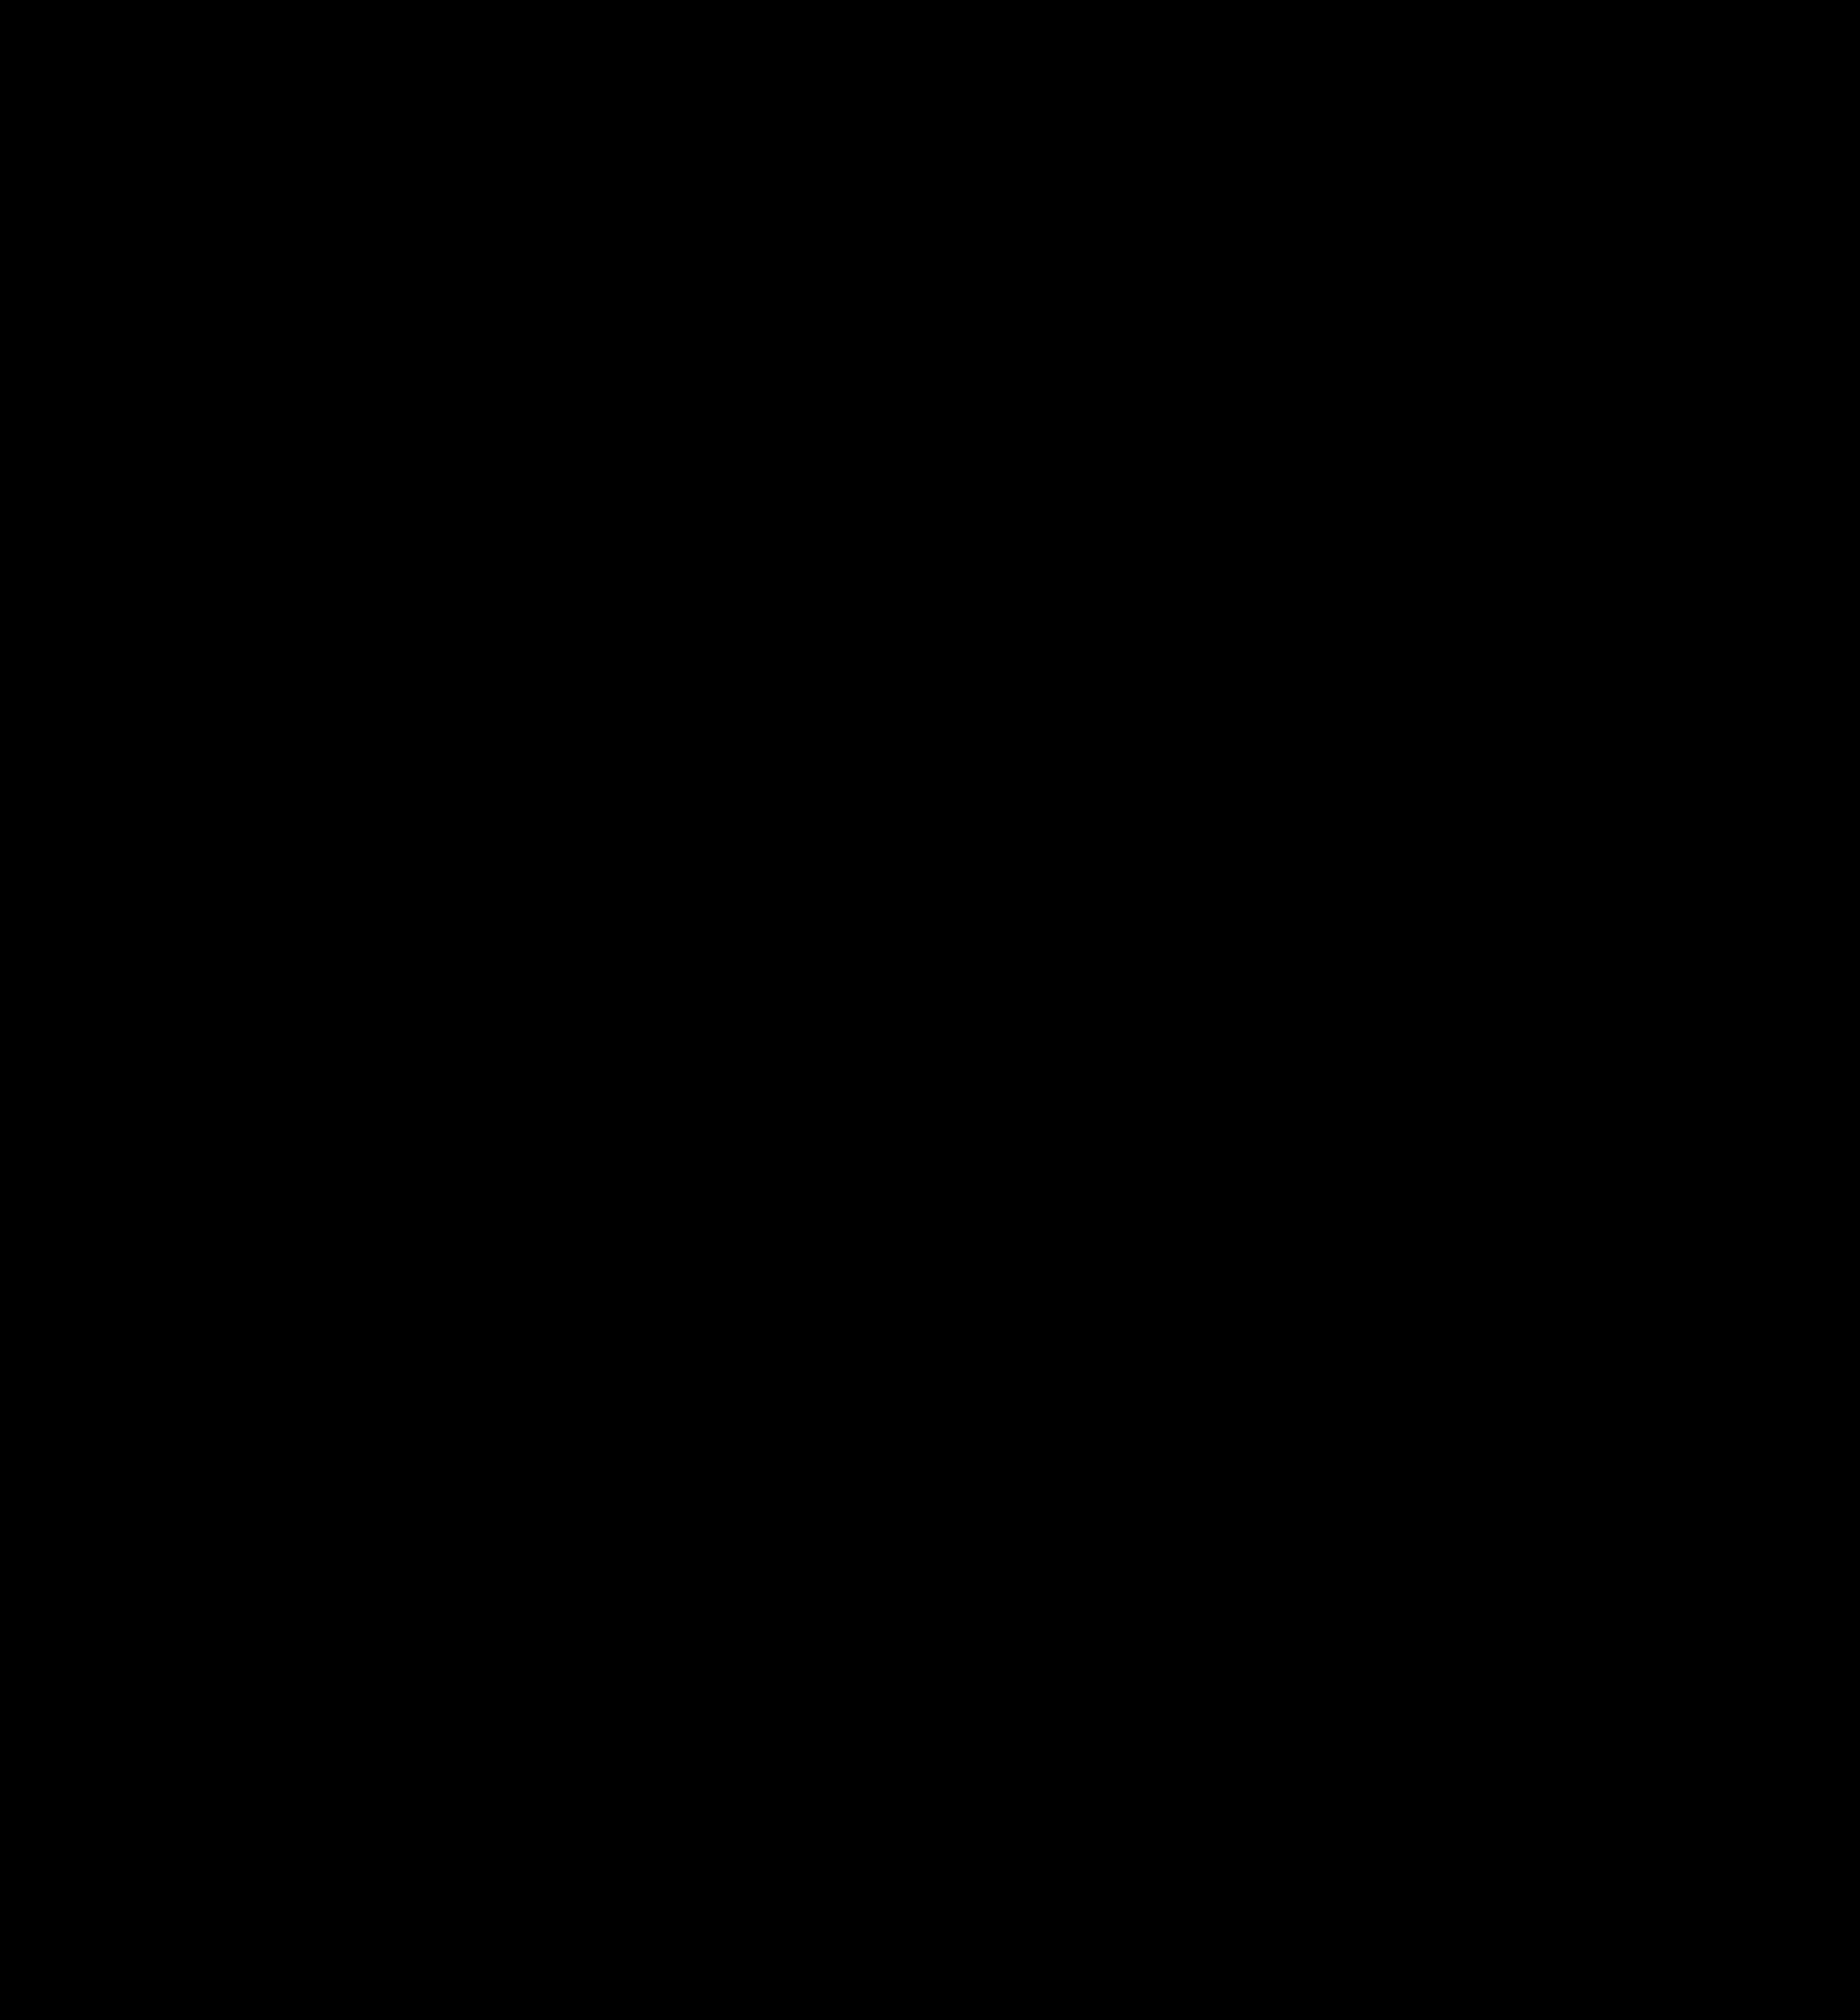 2156x2352 Clipart